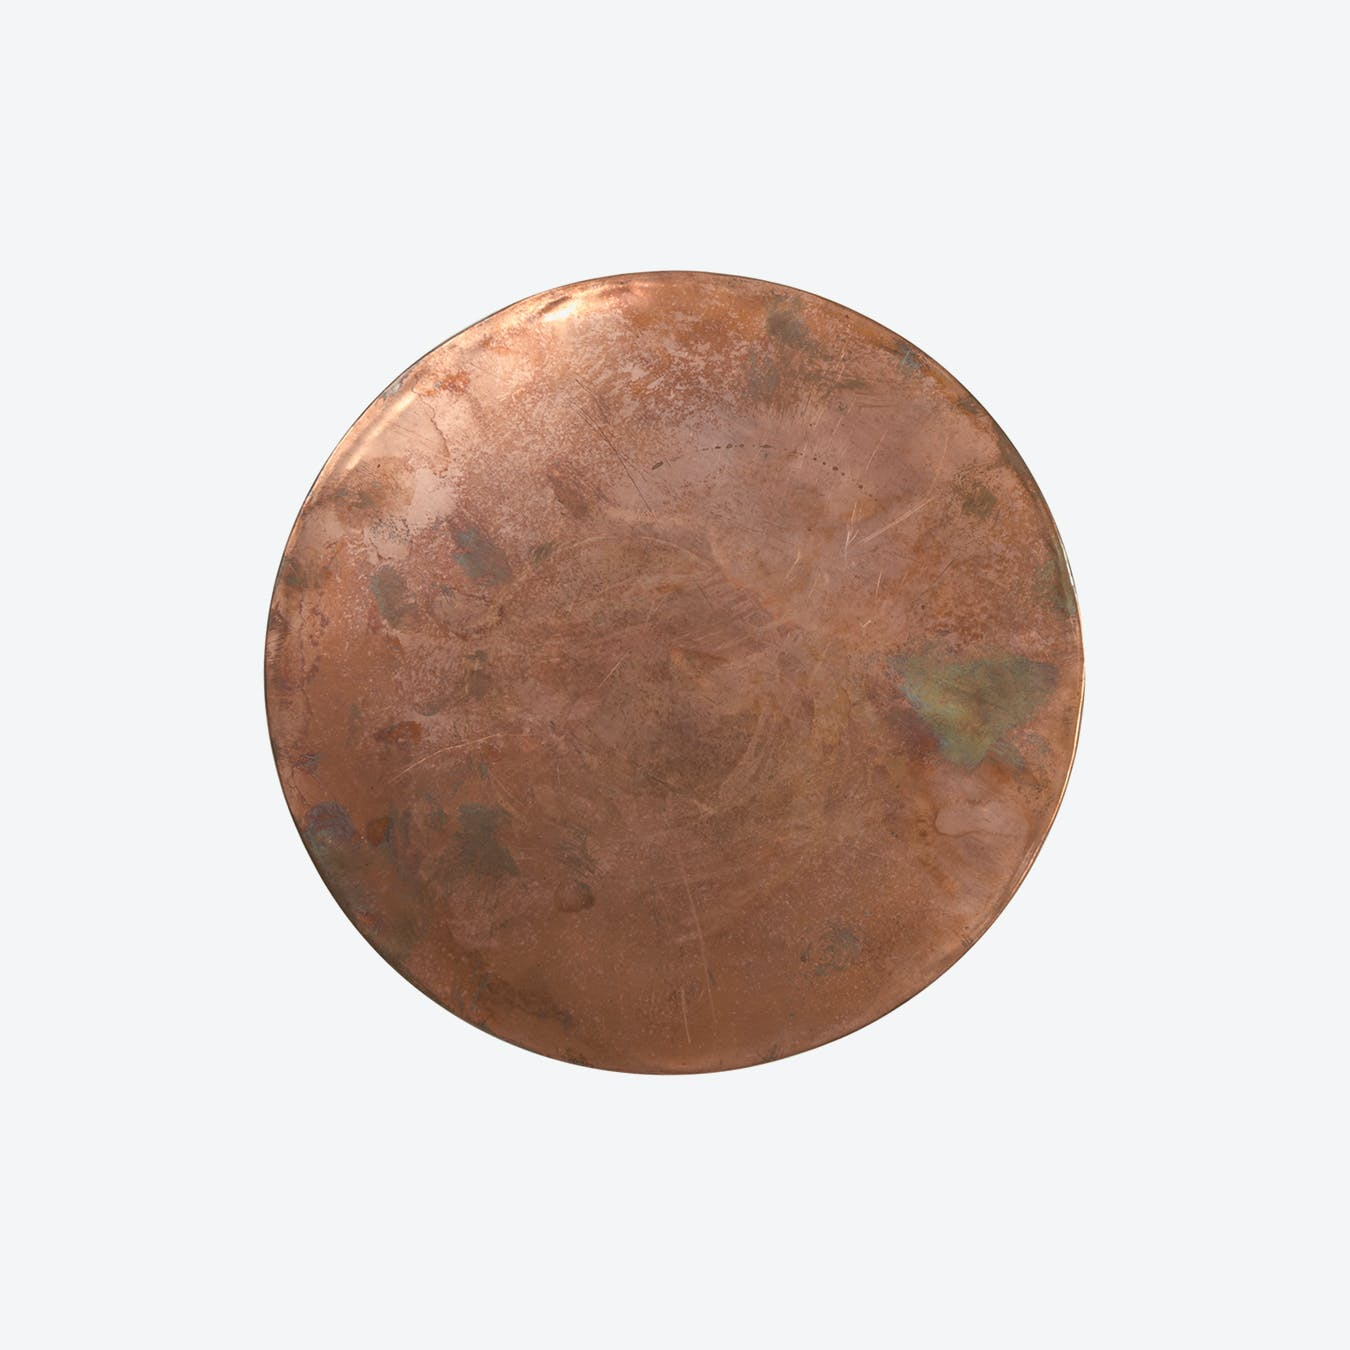 Copper Plated Brass Trivet